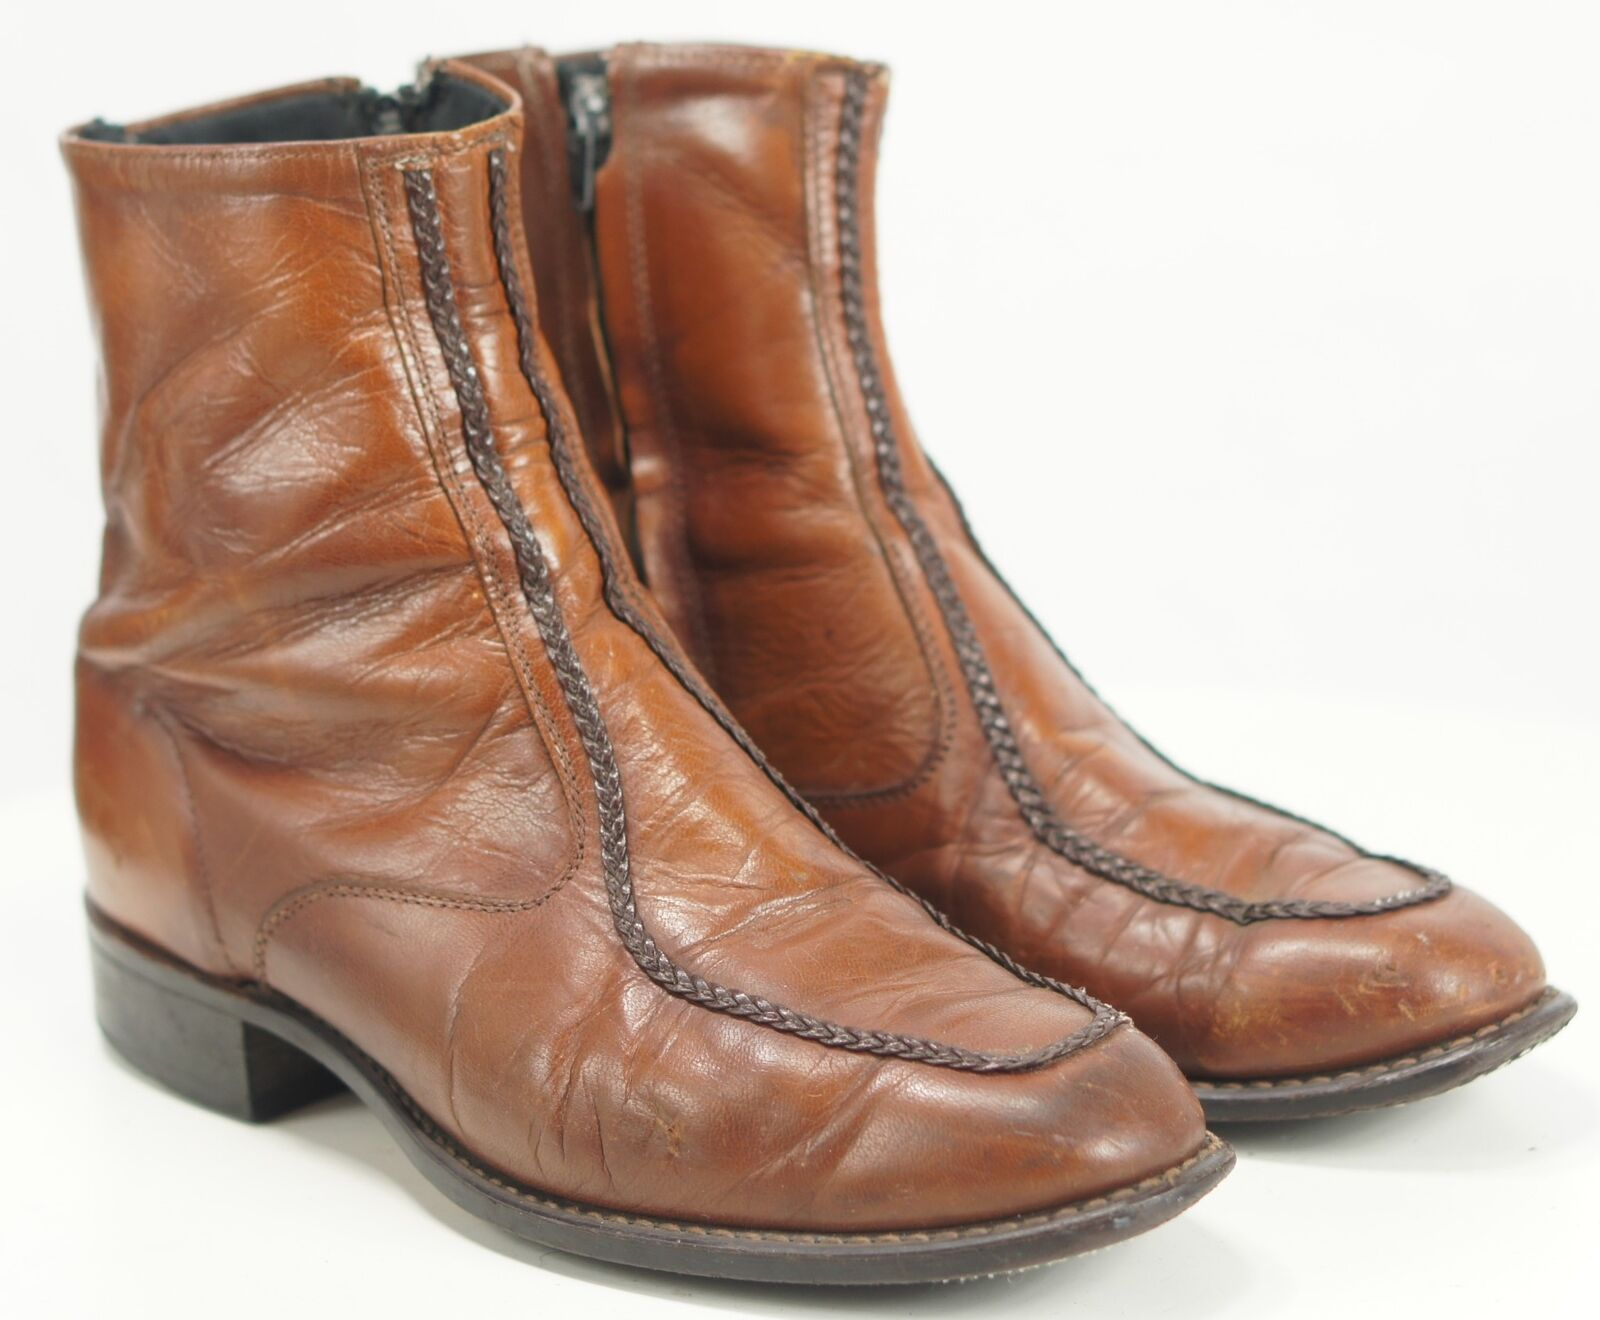 Men's Vintage US Union Made Half Ankle Chelsea Dealer Boots Braided Trim 9 EW